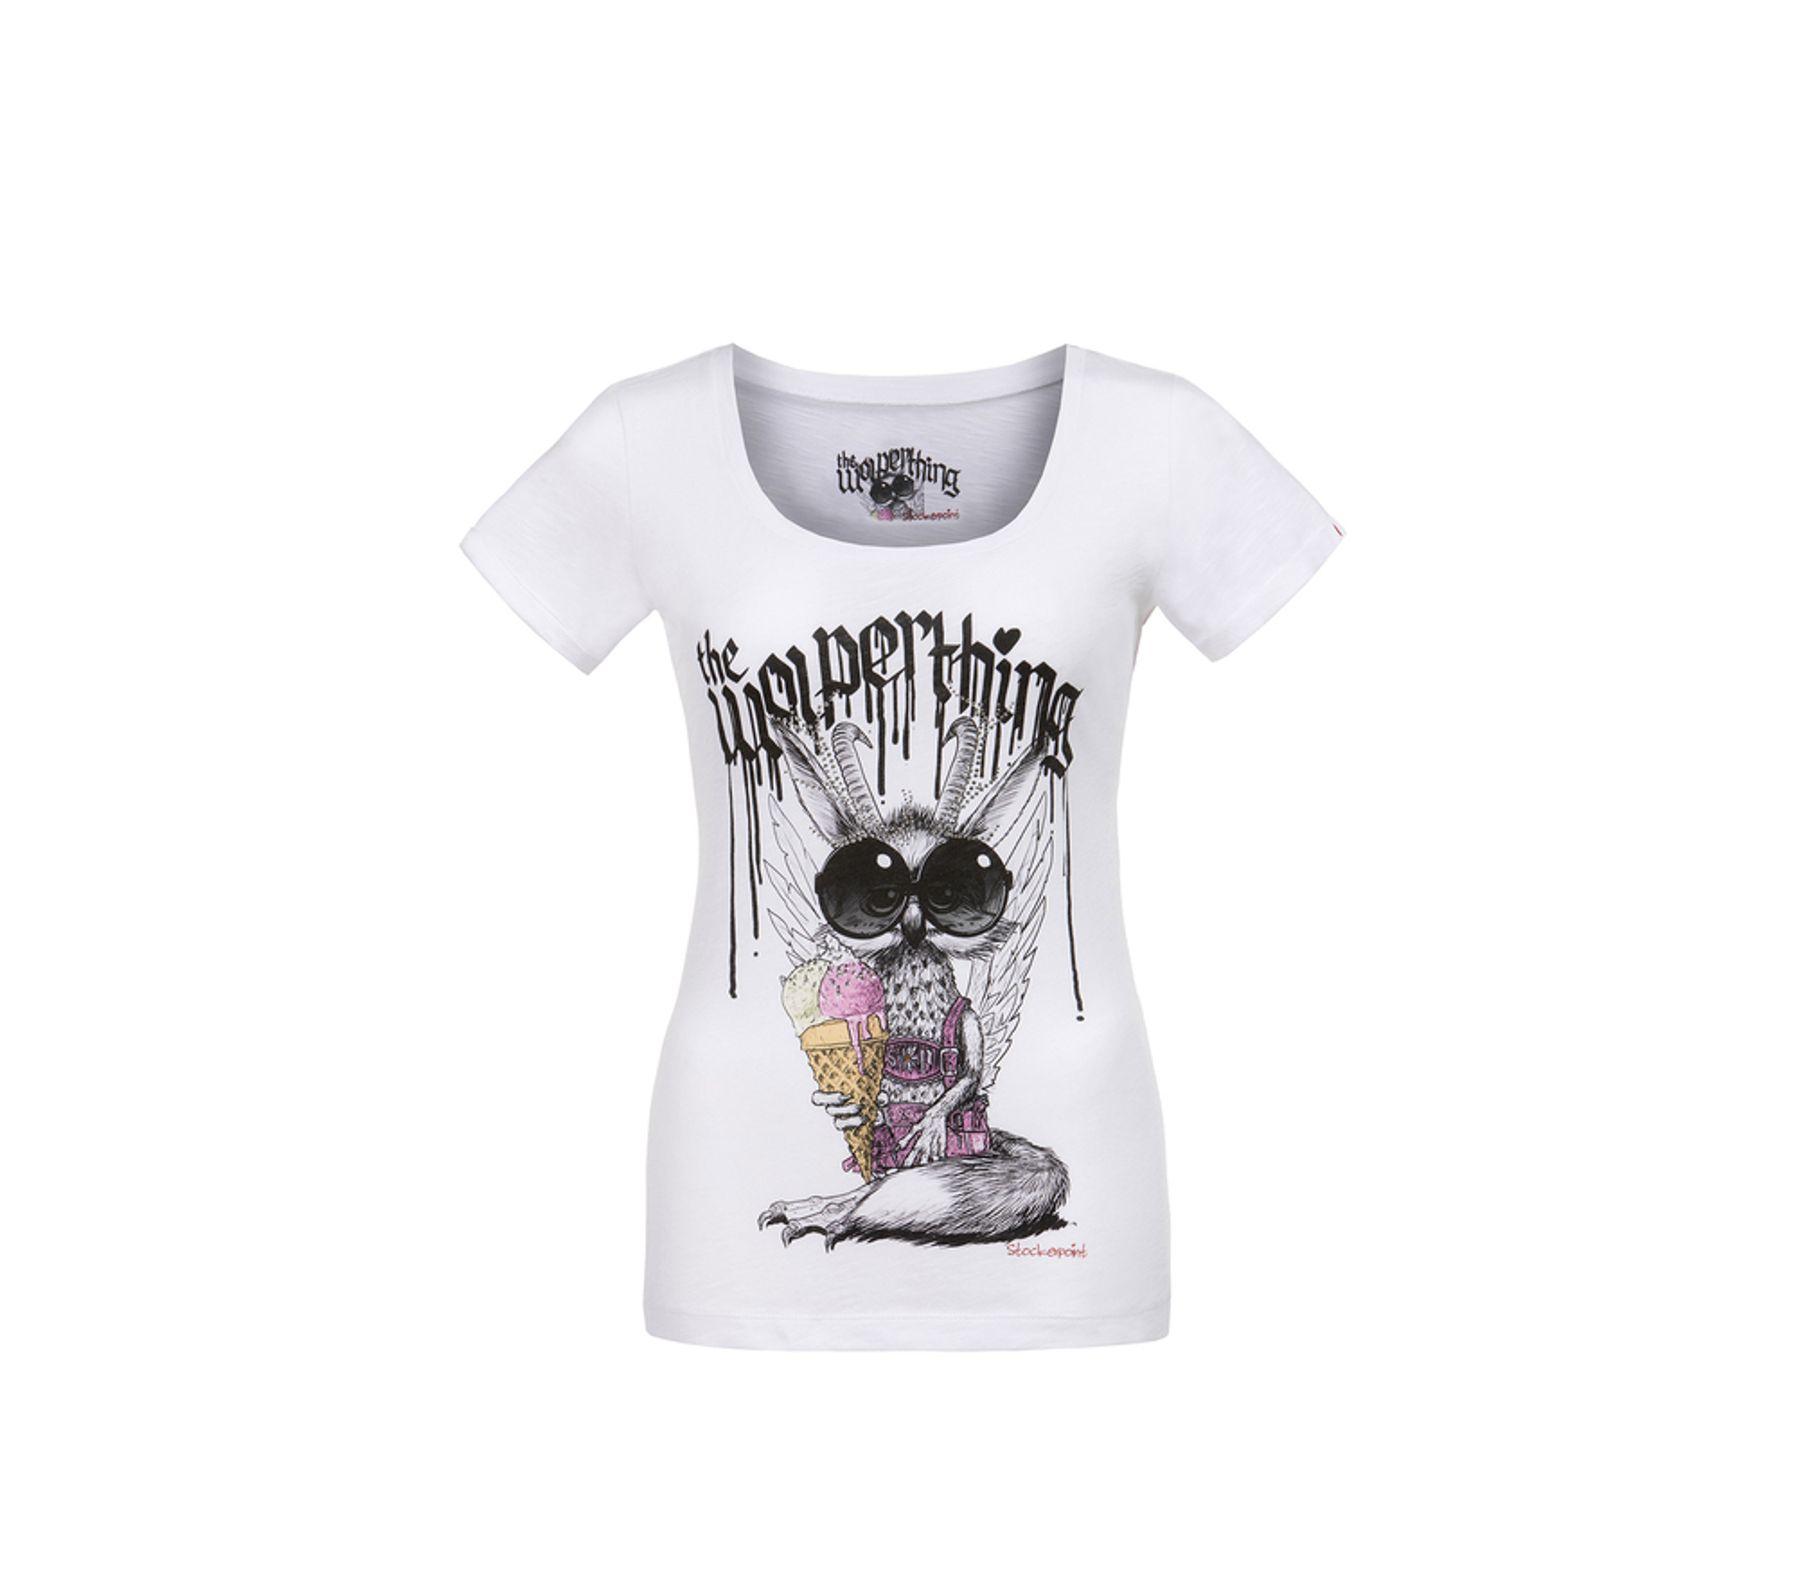 Stockerpoint - Kinder Trachten T-Shirt, Wolpigirl – Bild 1